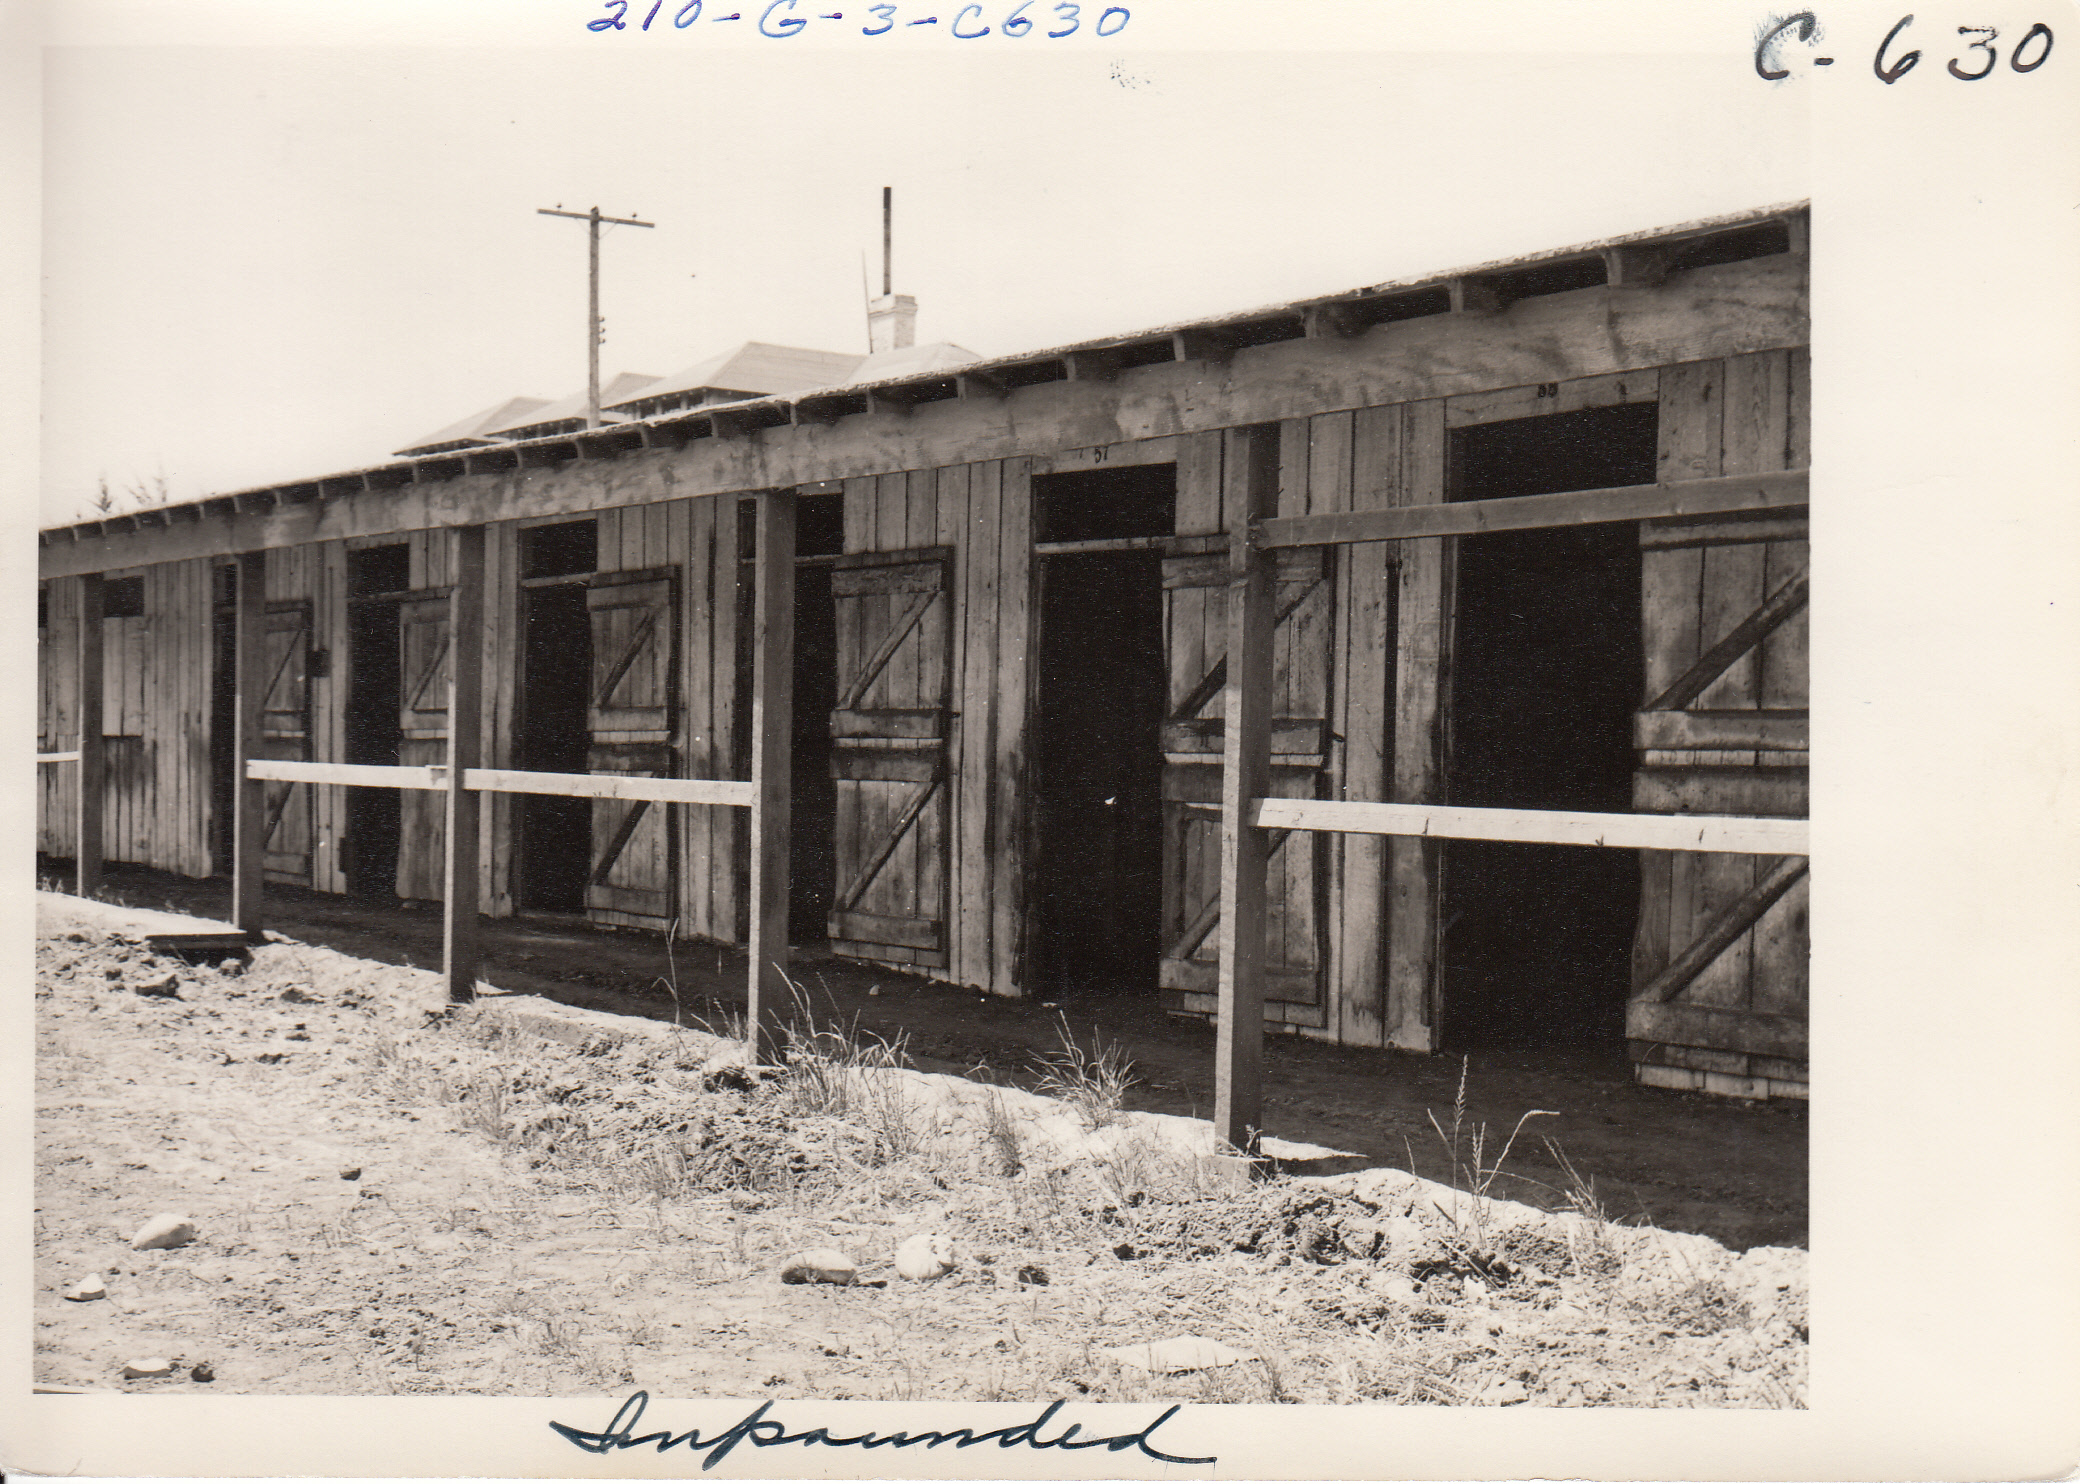 BART San Bruno Station Photo Exhibit